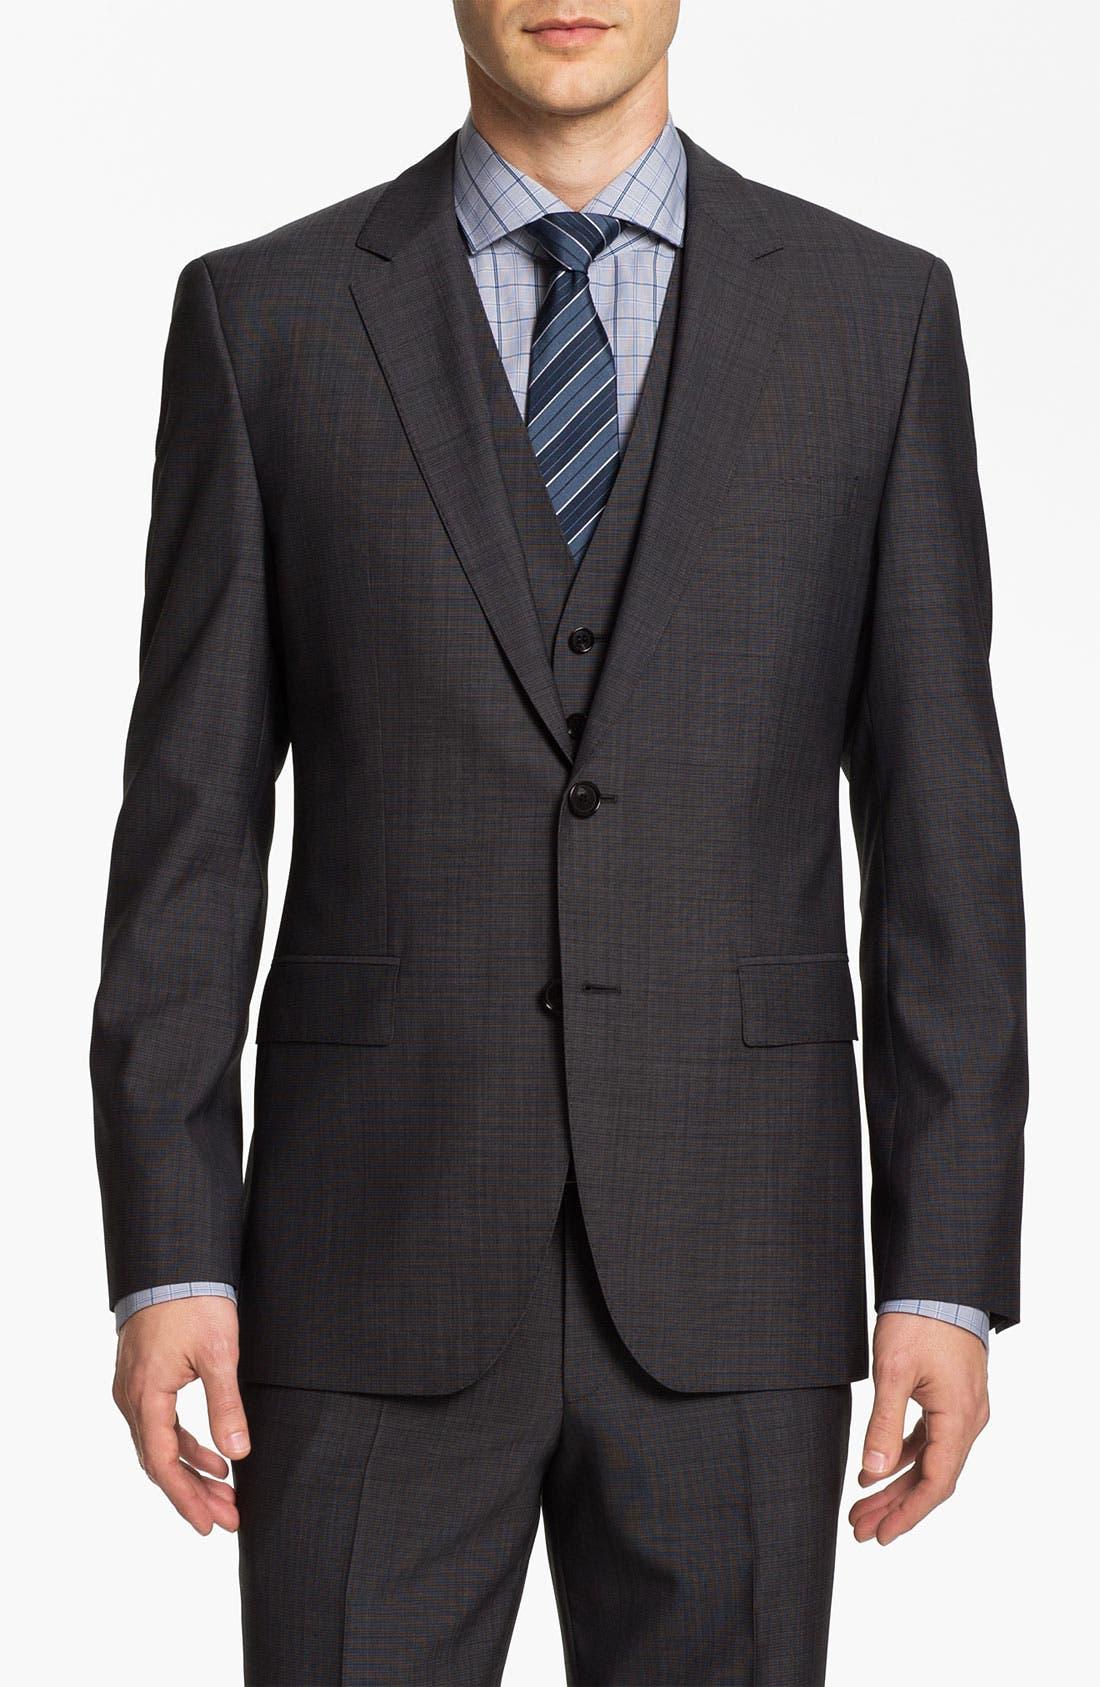 Main Image - BOSS Black 'James/Sharp' Trim Fit Three Piece Suit